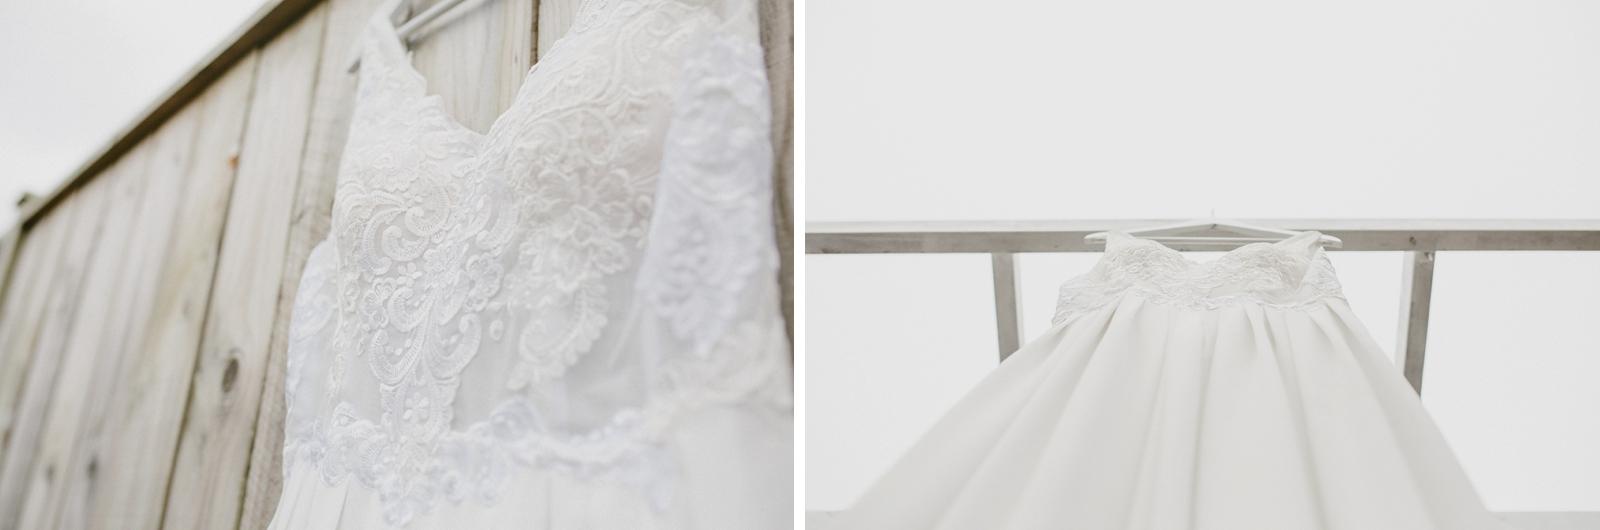 GabbyFiti_Auckland Wedding Photographer_Patty Lagera_0002.jpg